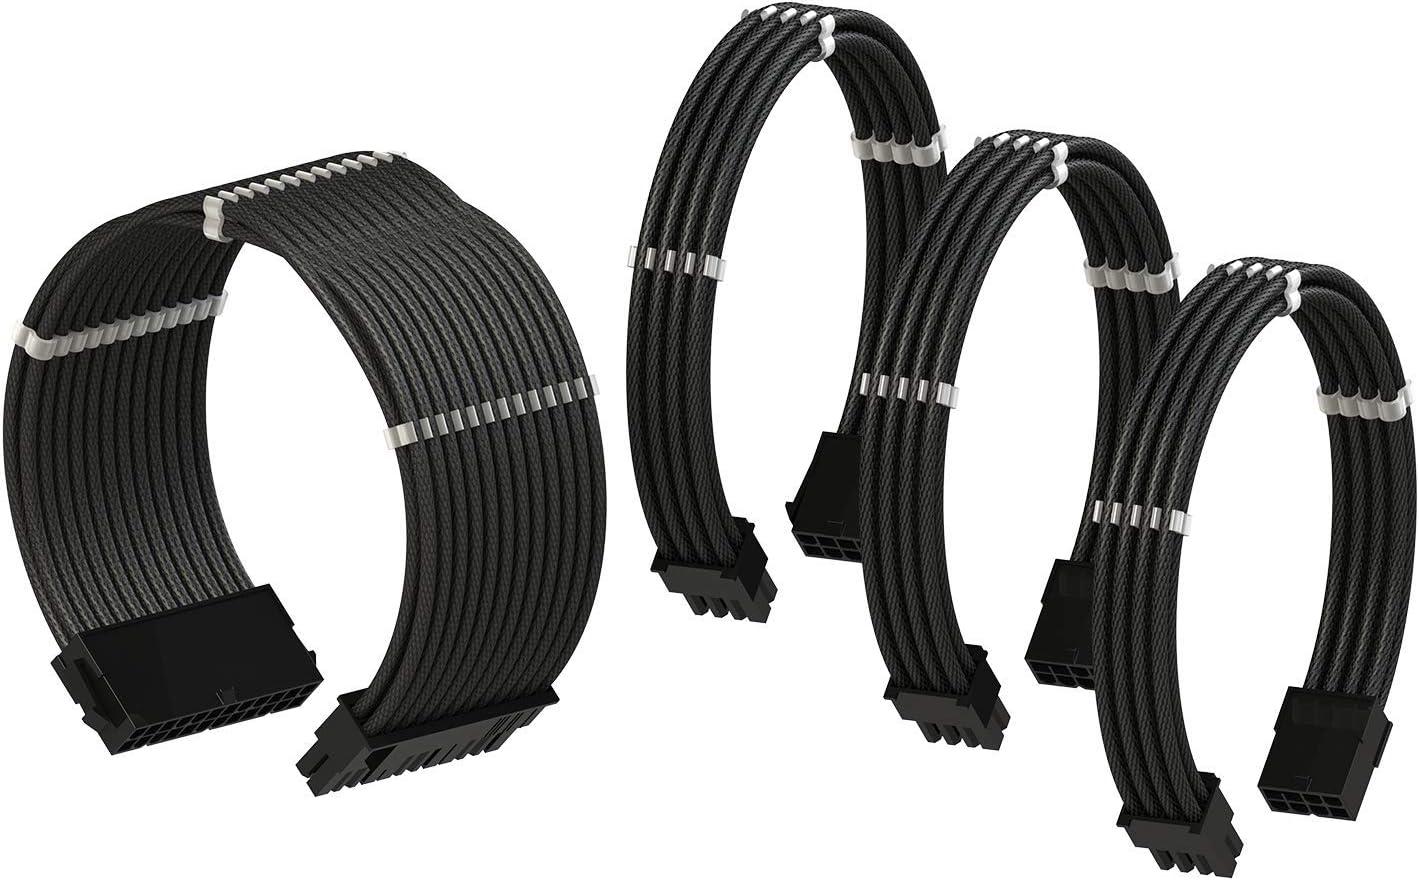 RedBlack PSU Cable Extension Sleeved Custom Mod PC Power Supply Braided w//Comb Single Pack GPU 30CM 300MM LINKUP 6+2 1x 8 P